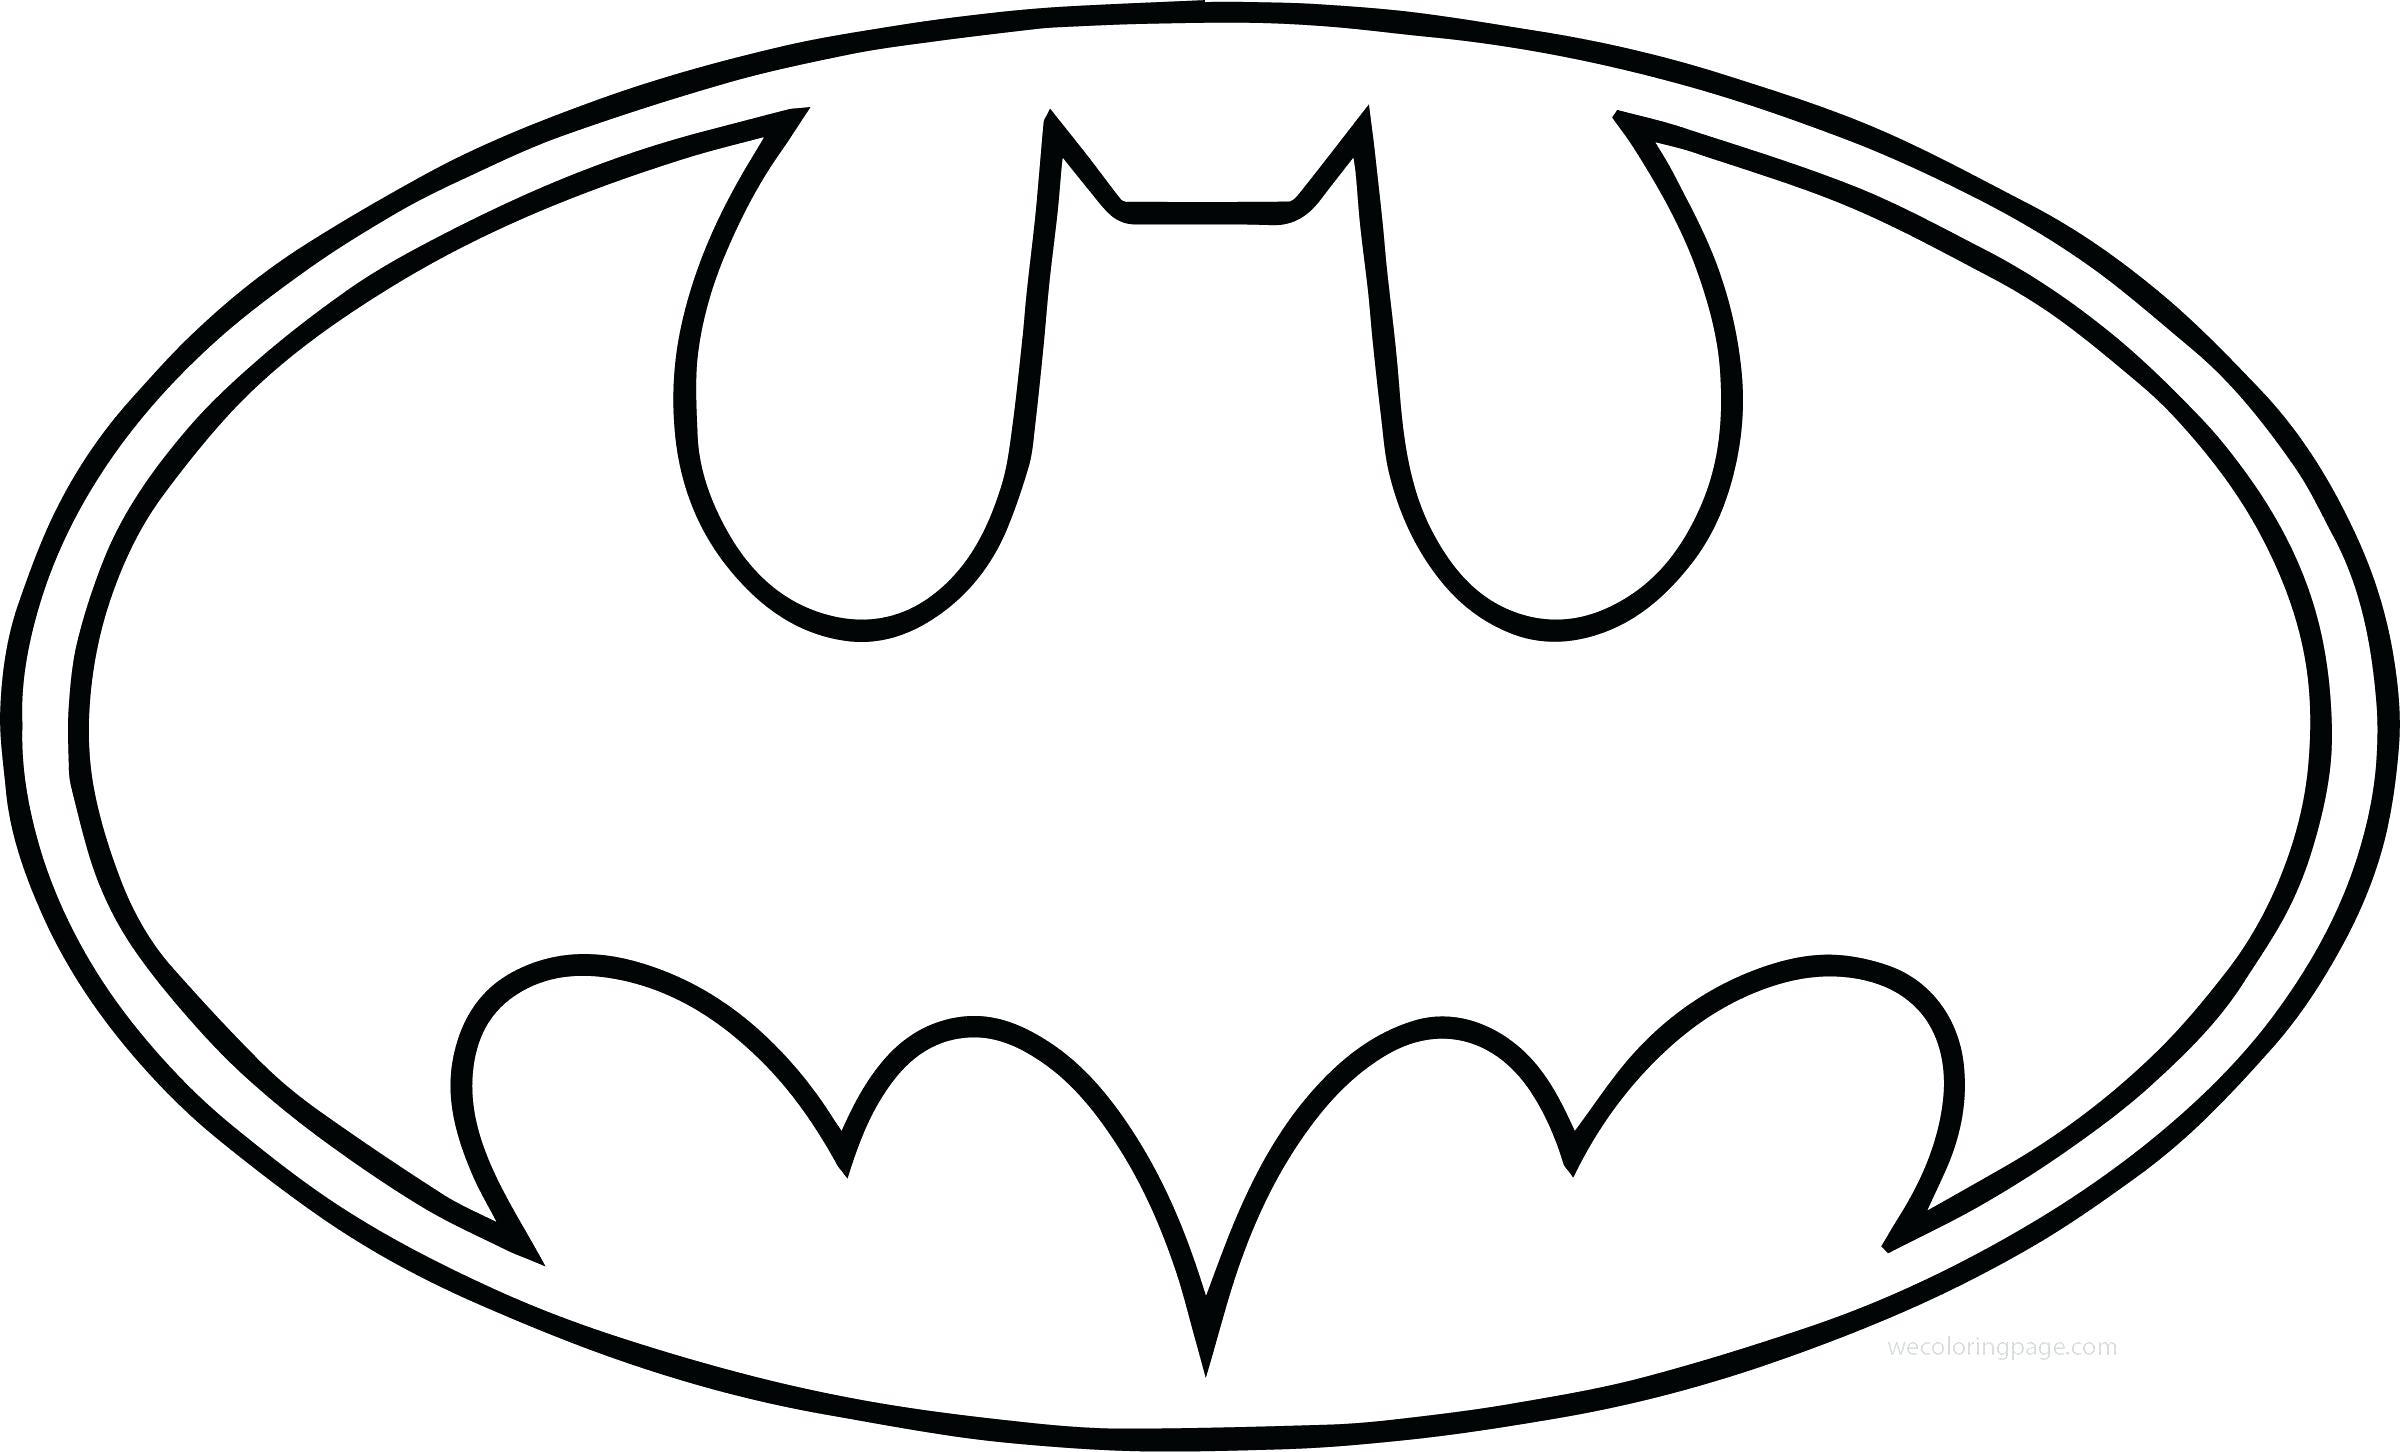 Superman Logo Outline | Free download on ClipArtMag